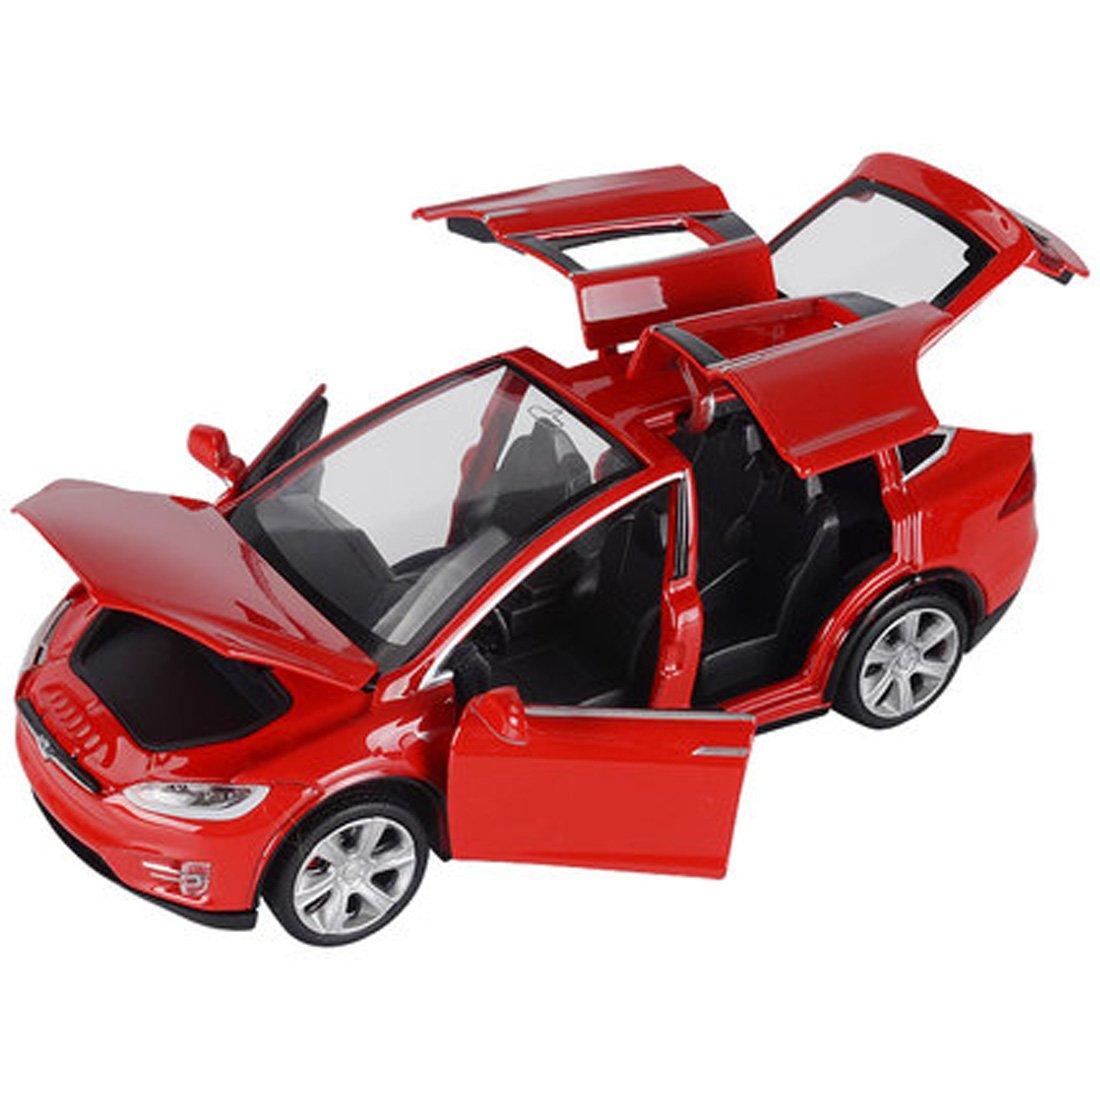 KMT Alloy Diecast Car Models Tesla Model X 90 Car Model (Red) KMT AUTO SUPPLIES